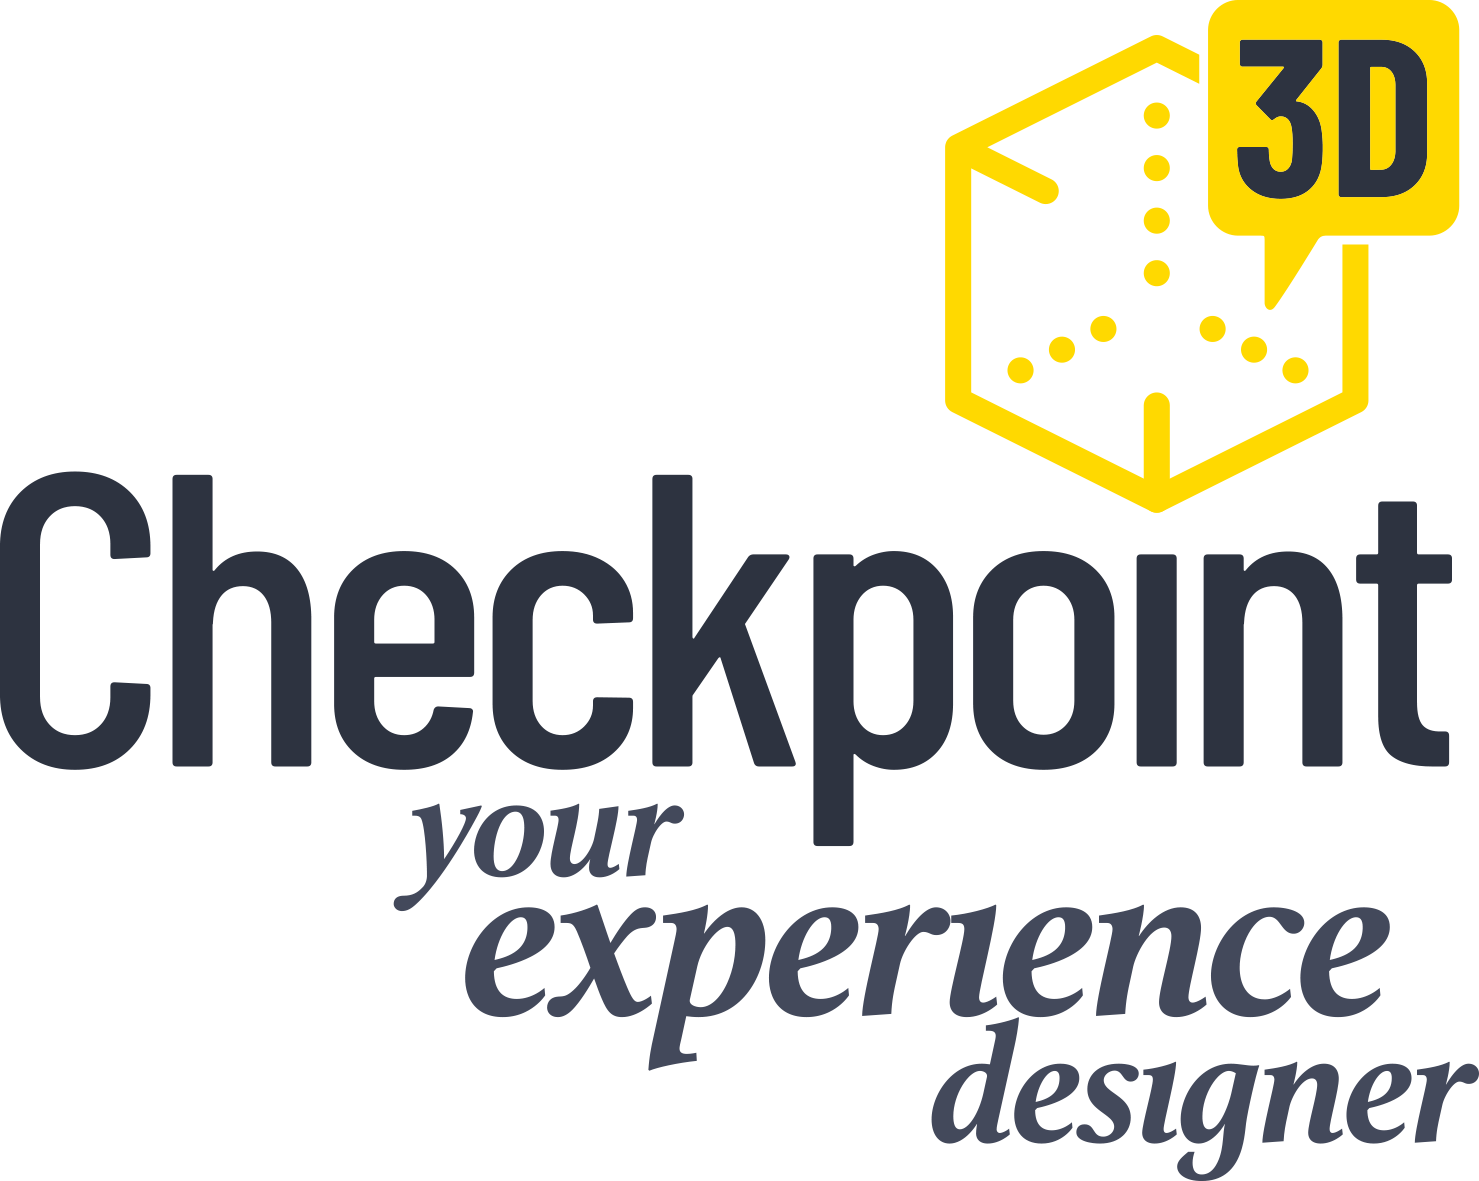 Checkpoint_3D logo